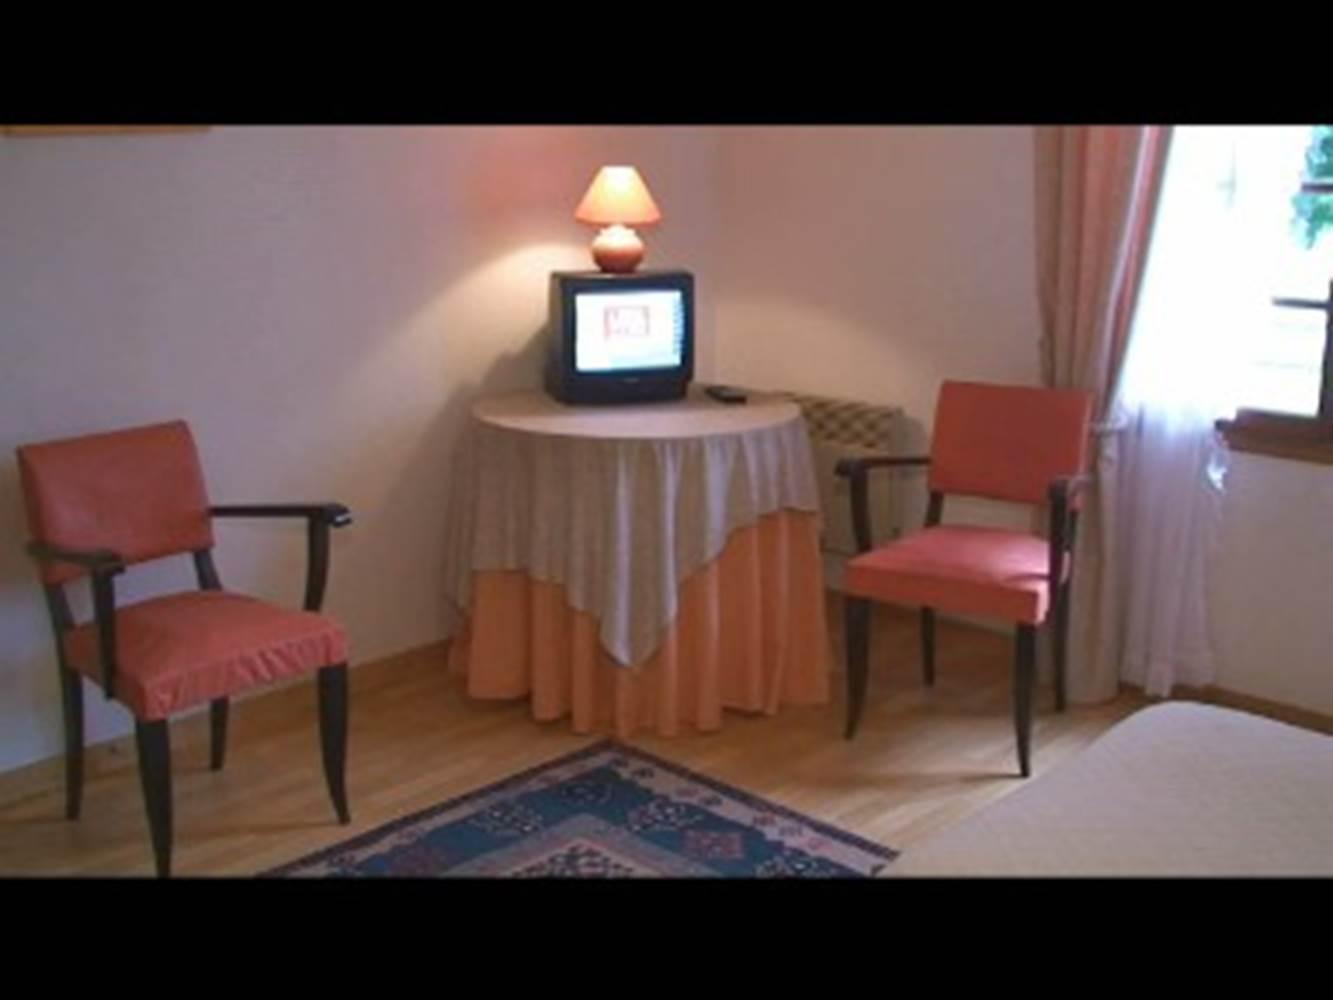 Chambre d'hotes-Guidel-Lorient-Groix-Morbihan-Bretagne sud - 12 personnes © Hamon